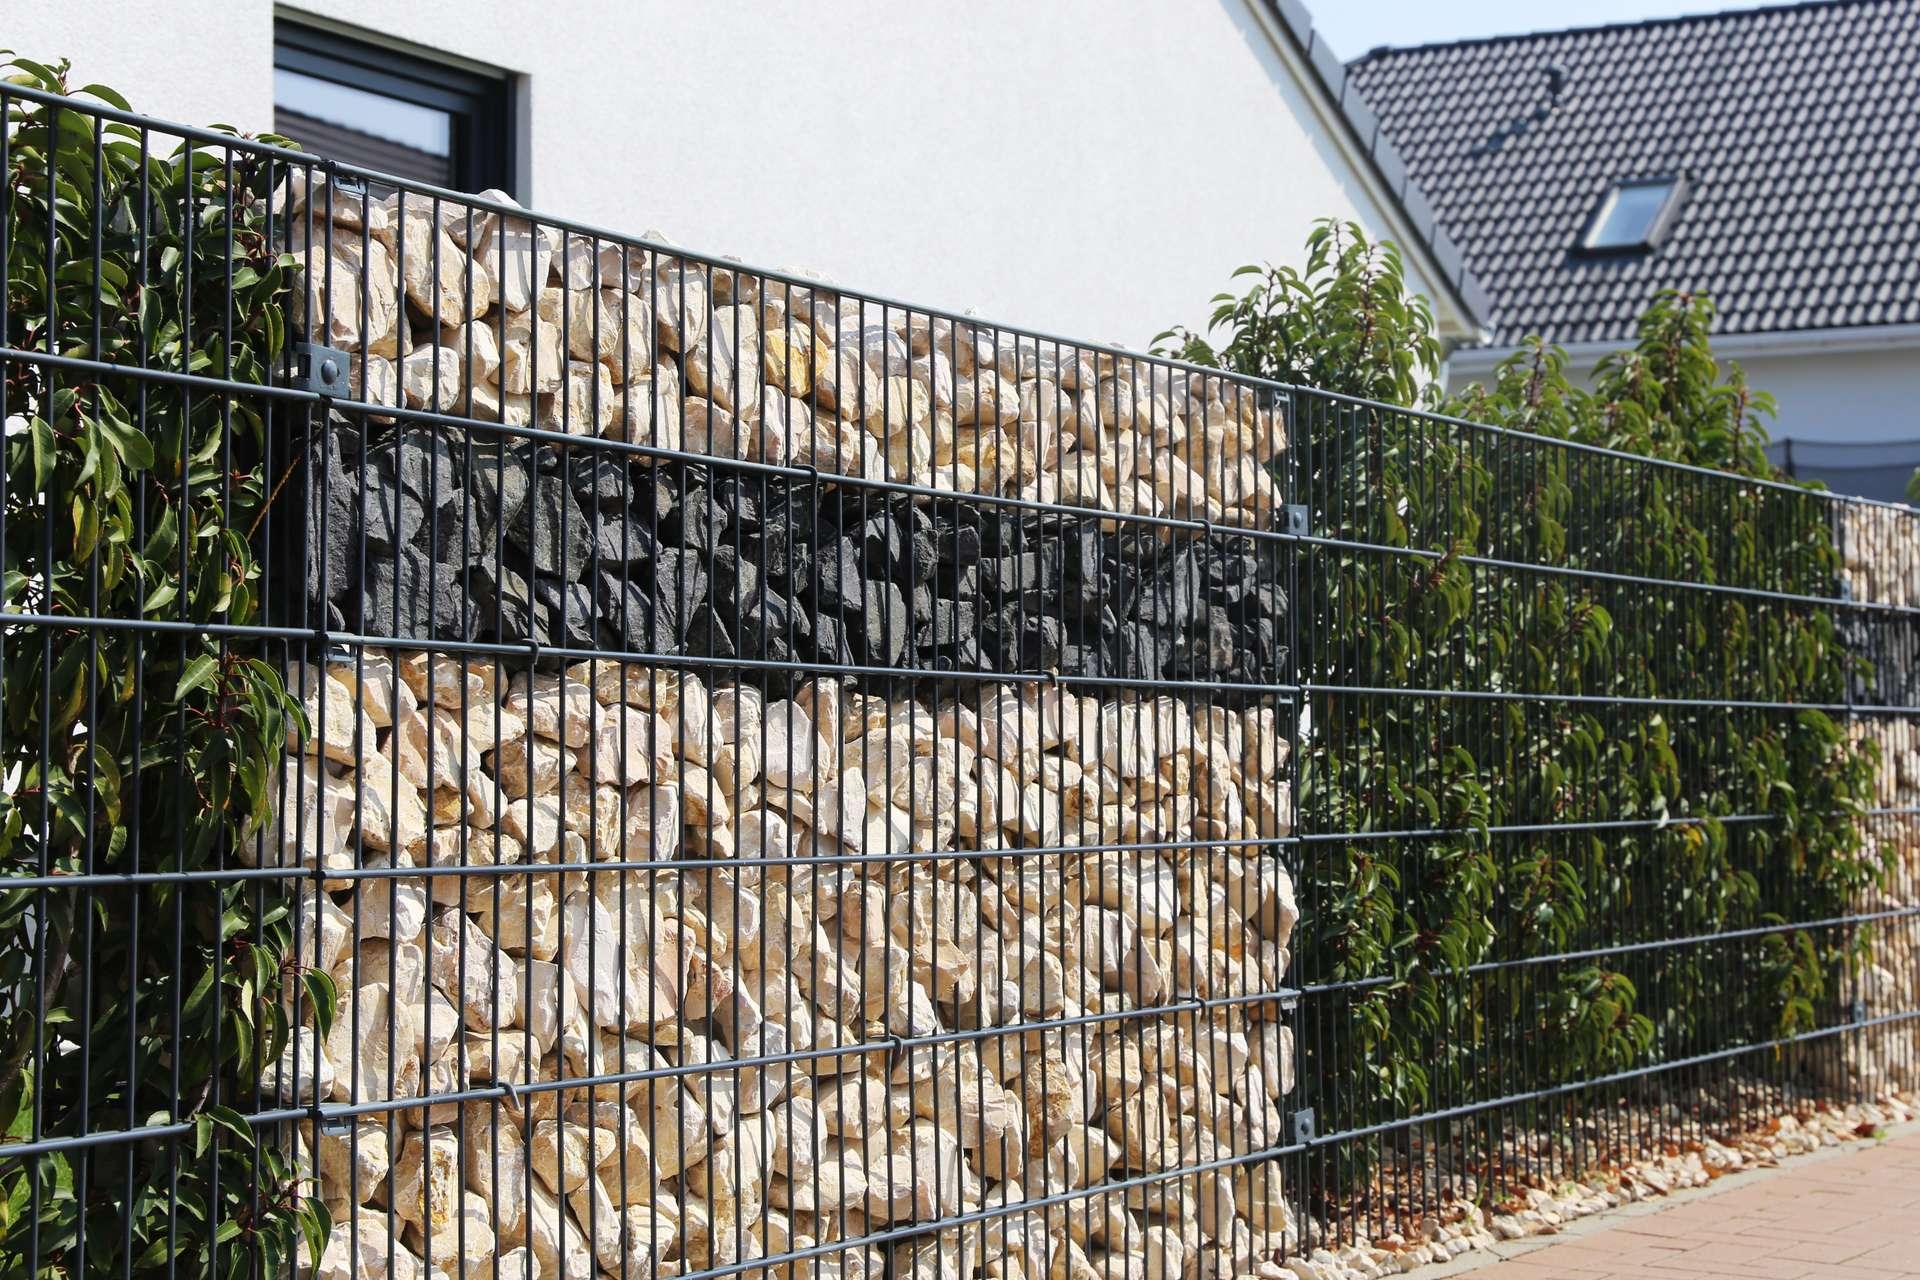 Garten Sichtschutz Metall Local Ch